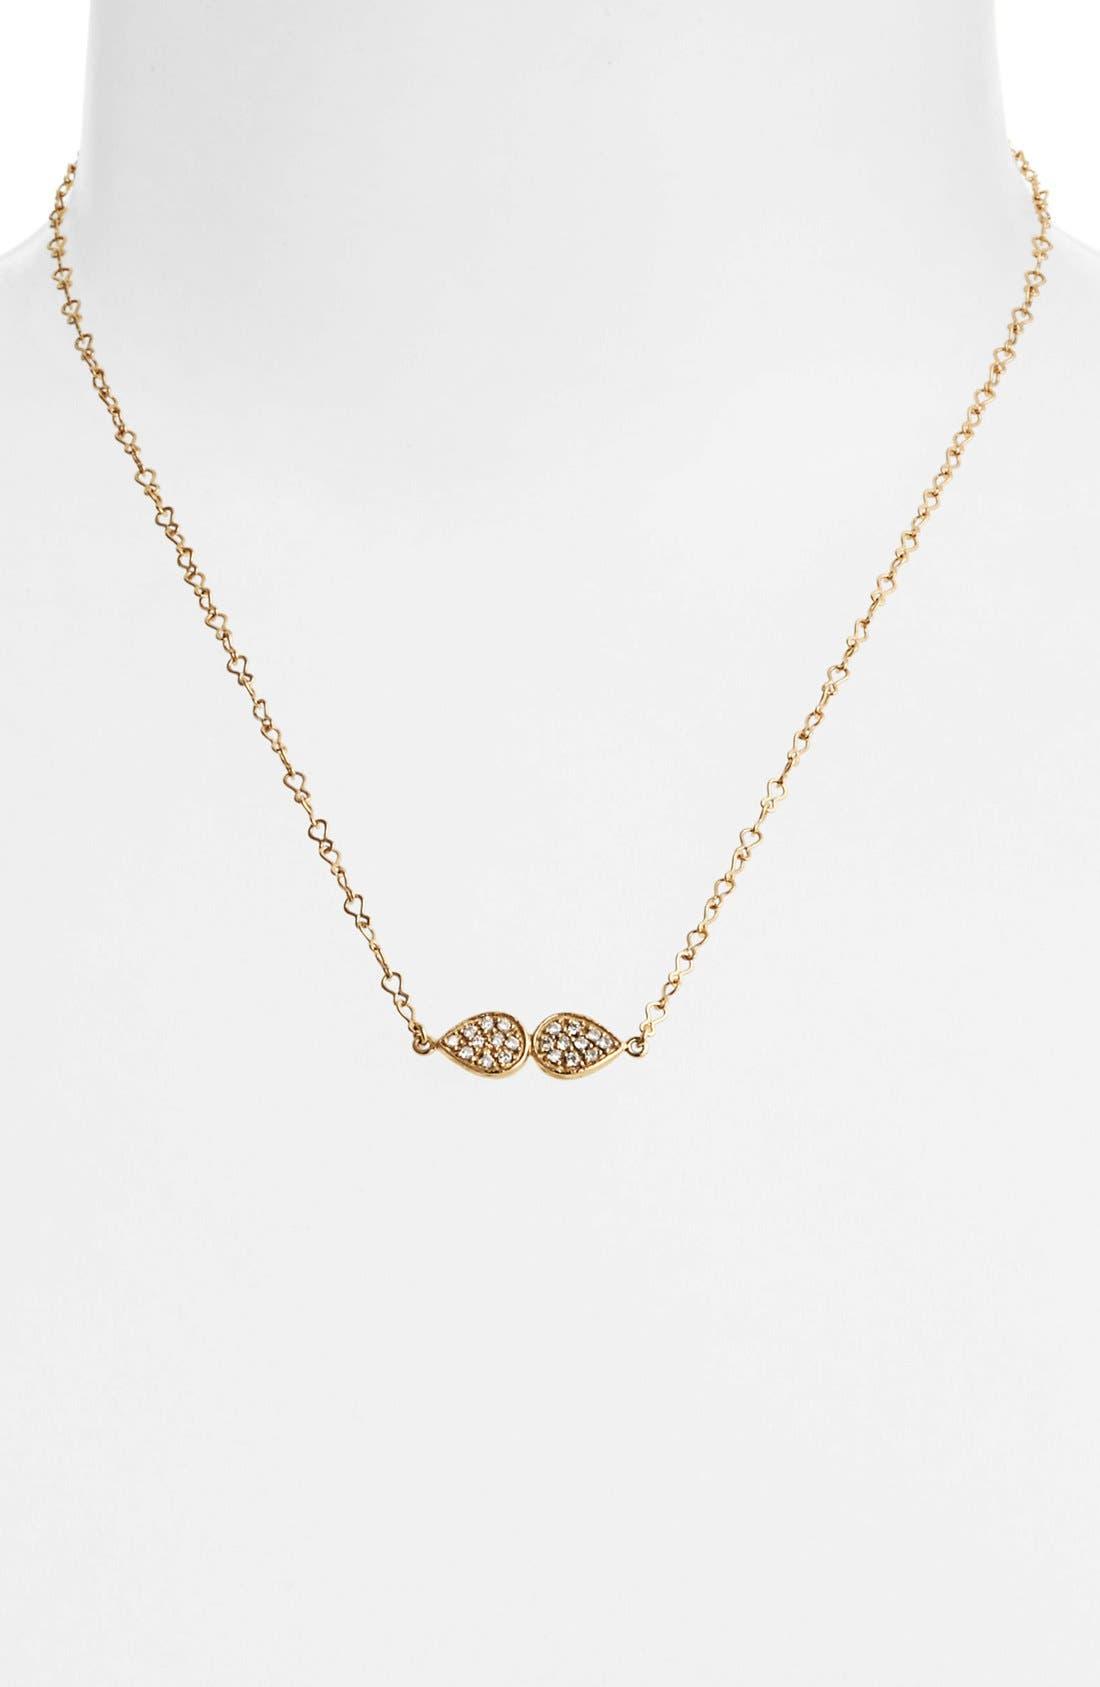 Alternate Image 1 Selected - Melinda Maria 'June - Leaf' Pendant Necklace